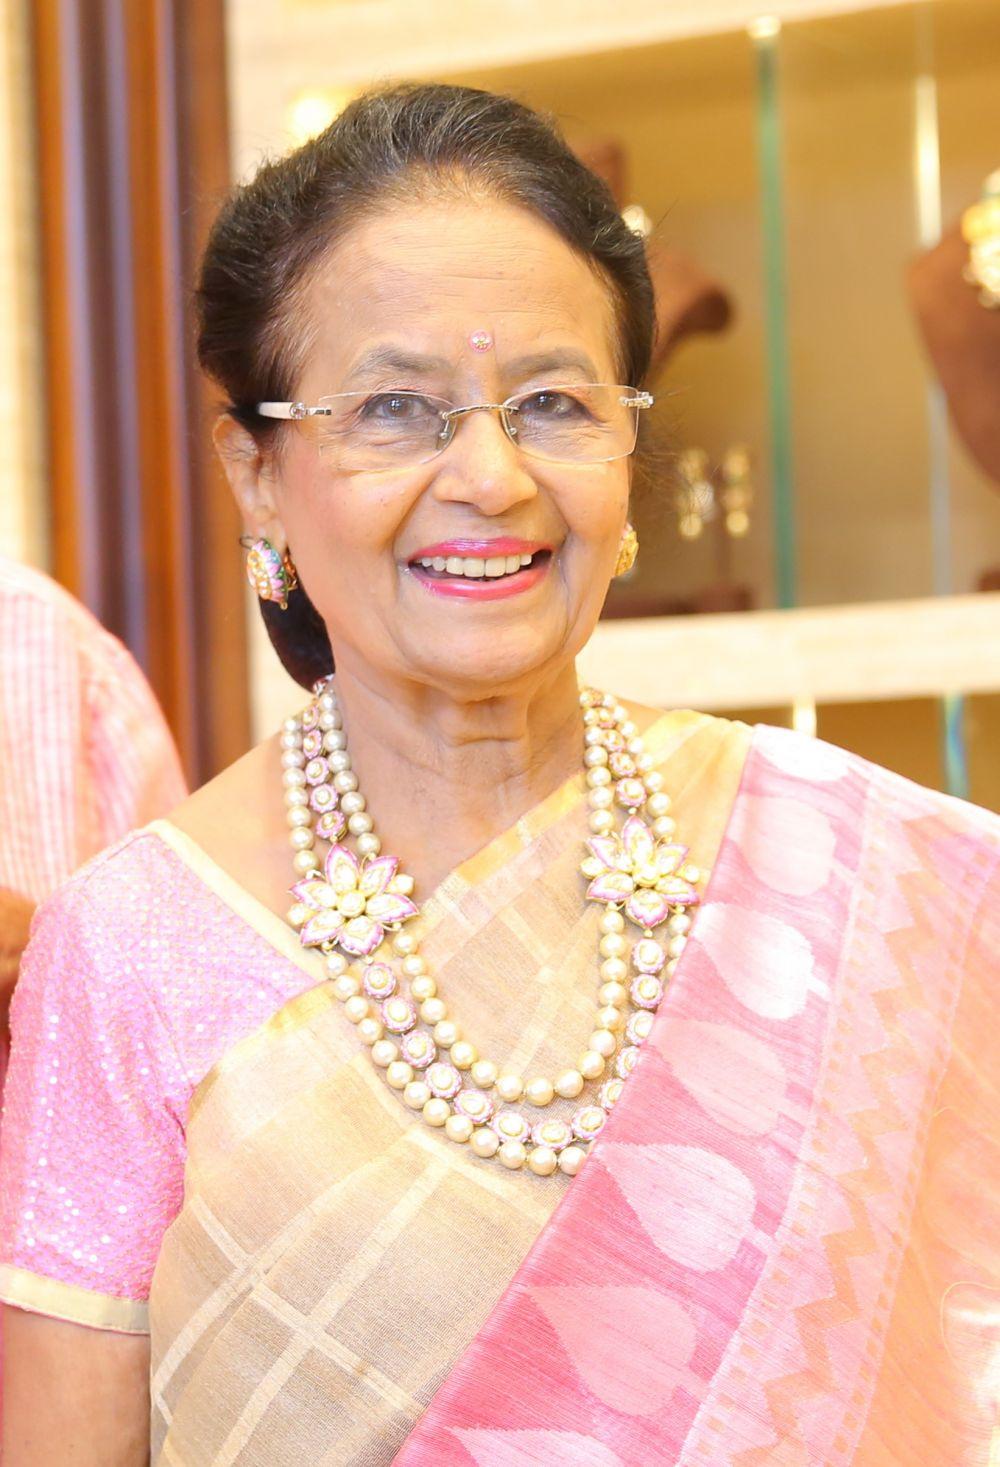 Shobha Choksey, Founder of Shobha Shringar Jewellers